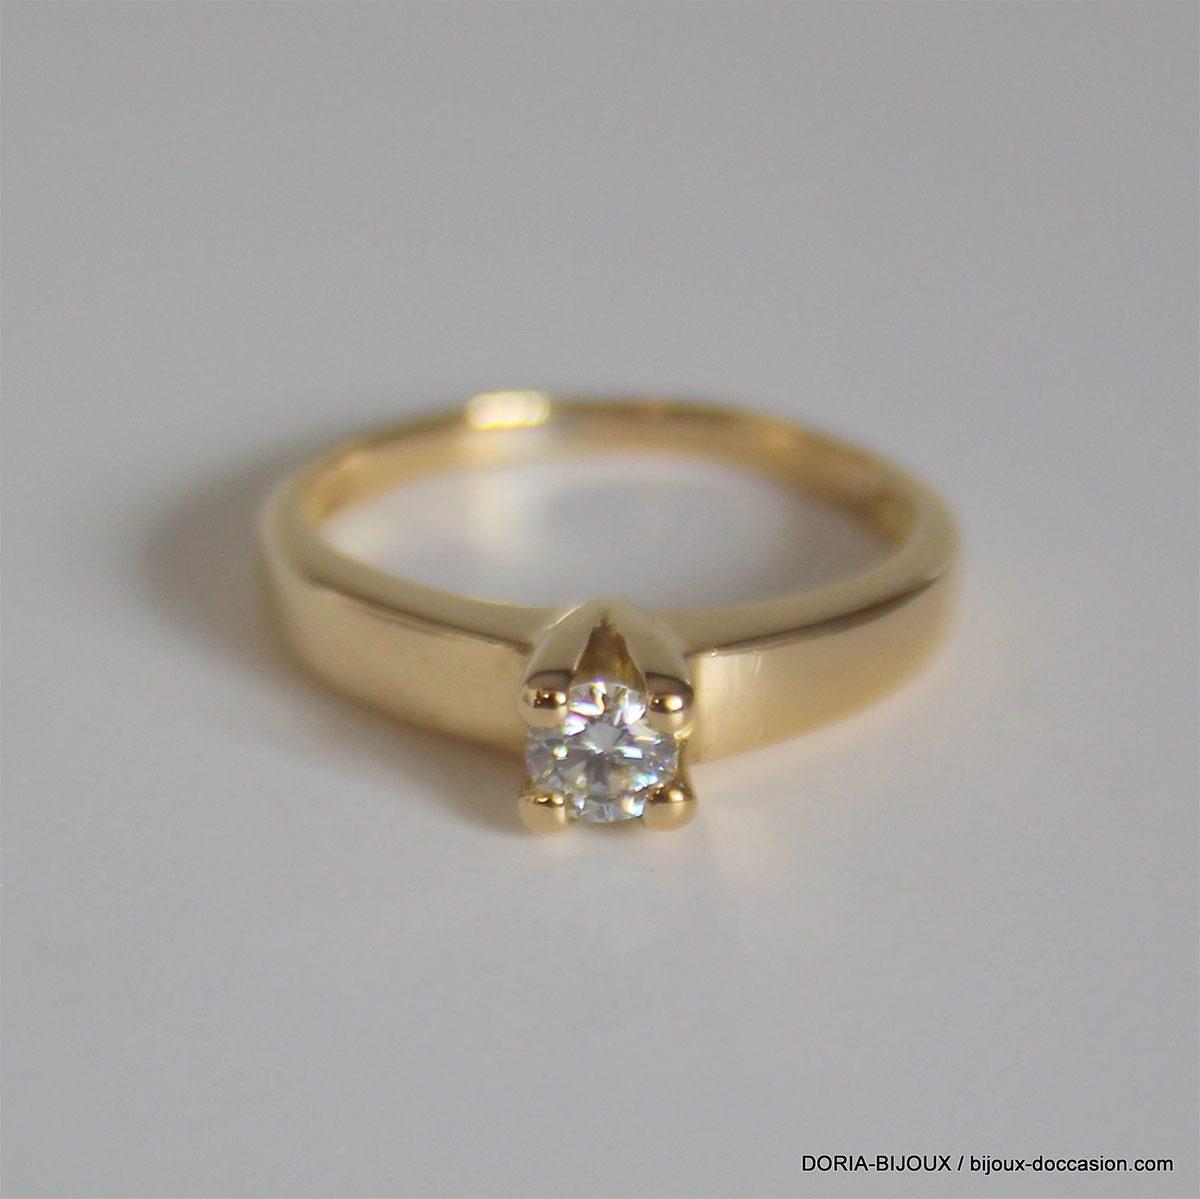 Bague Solitaire Or 750 Diamant 0.23carats 3.3grs -55